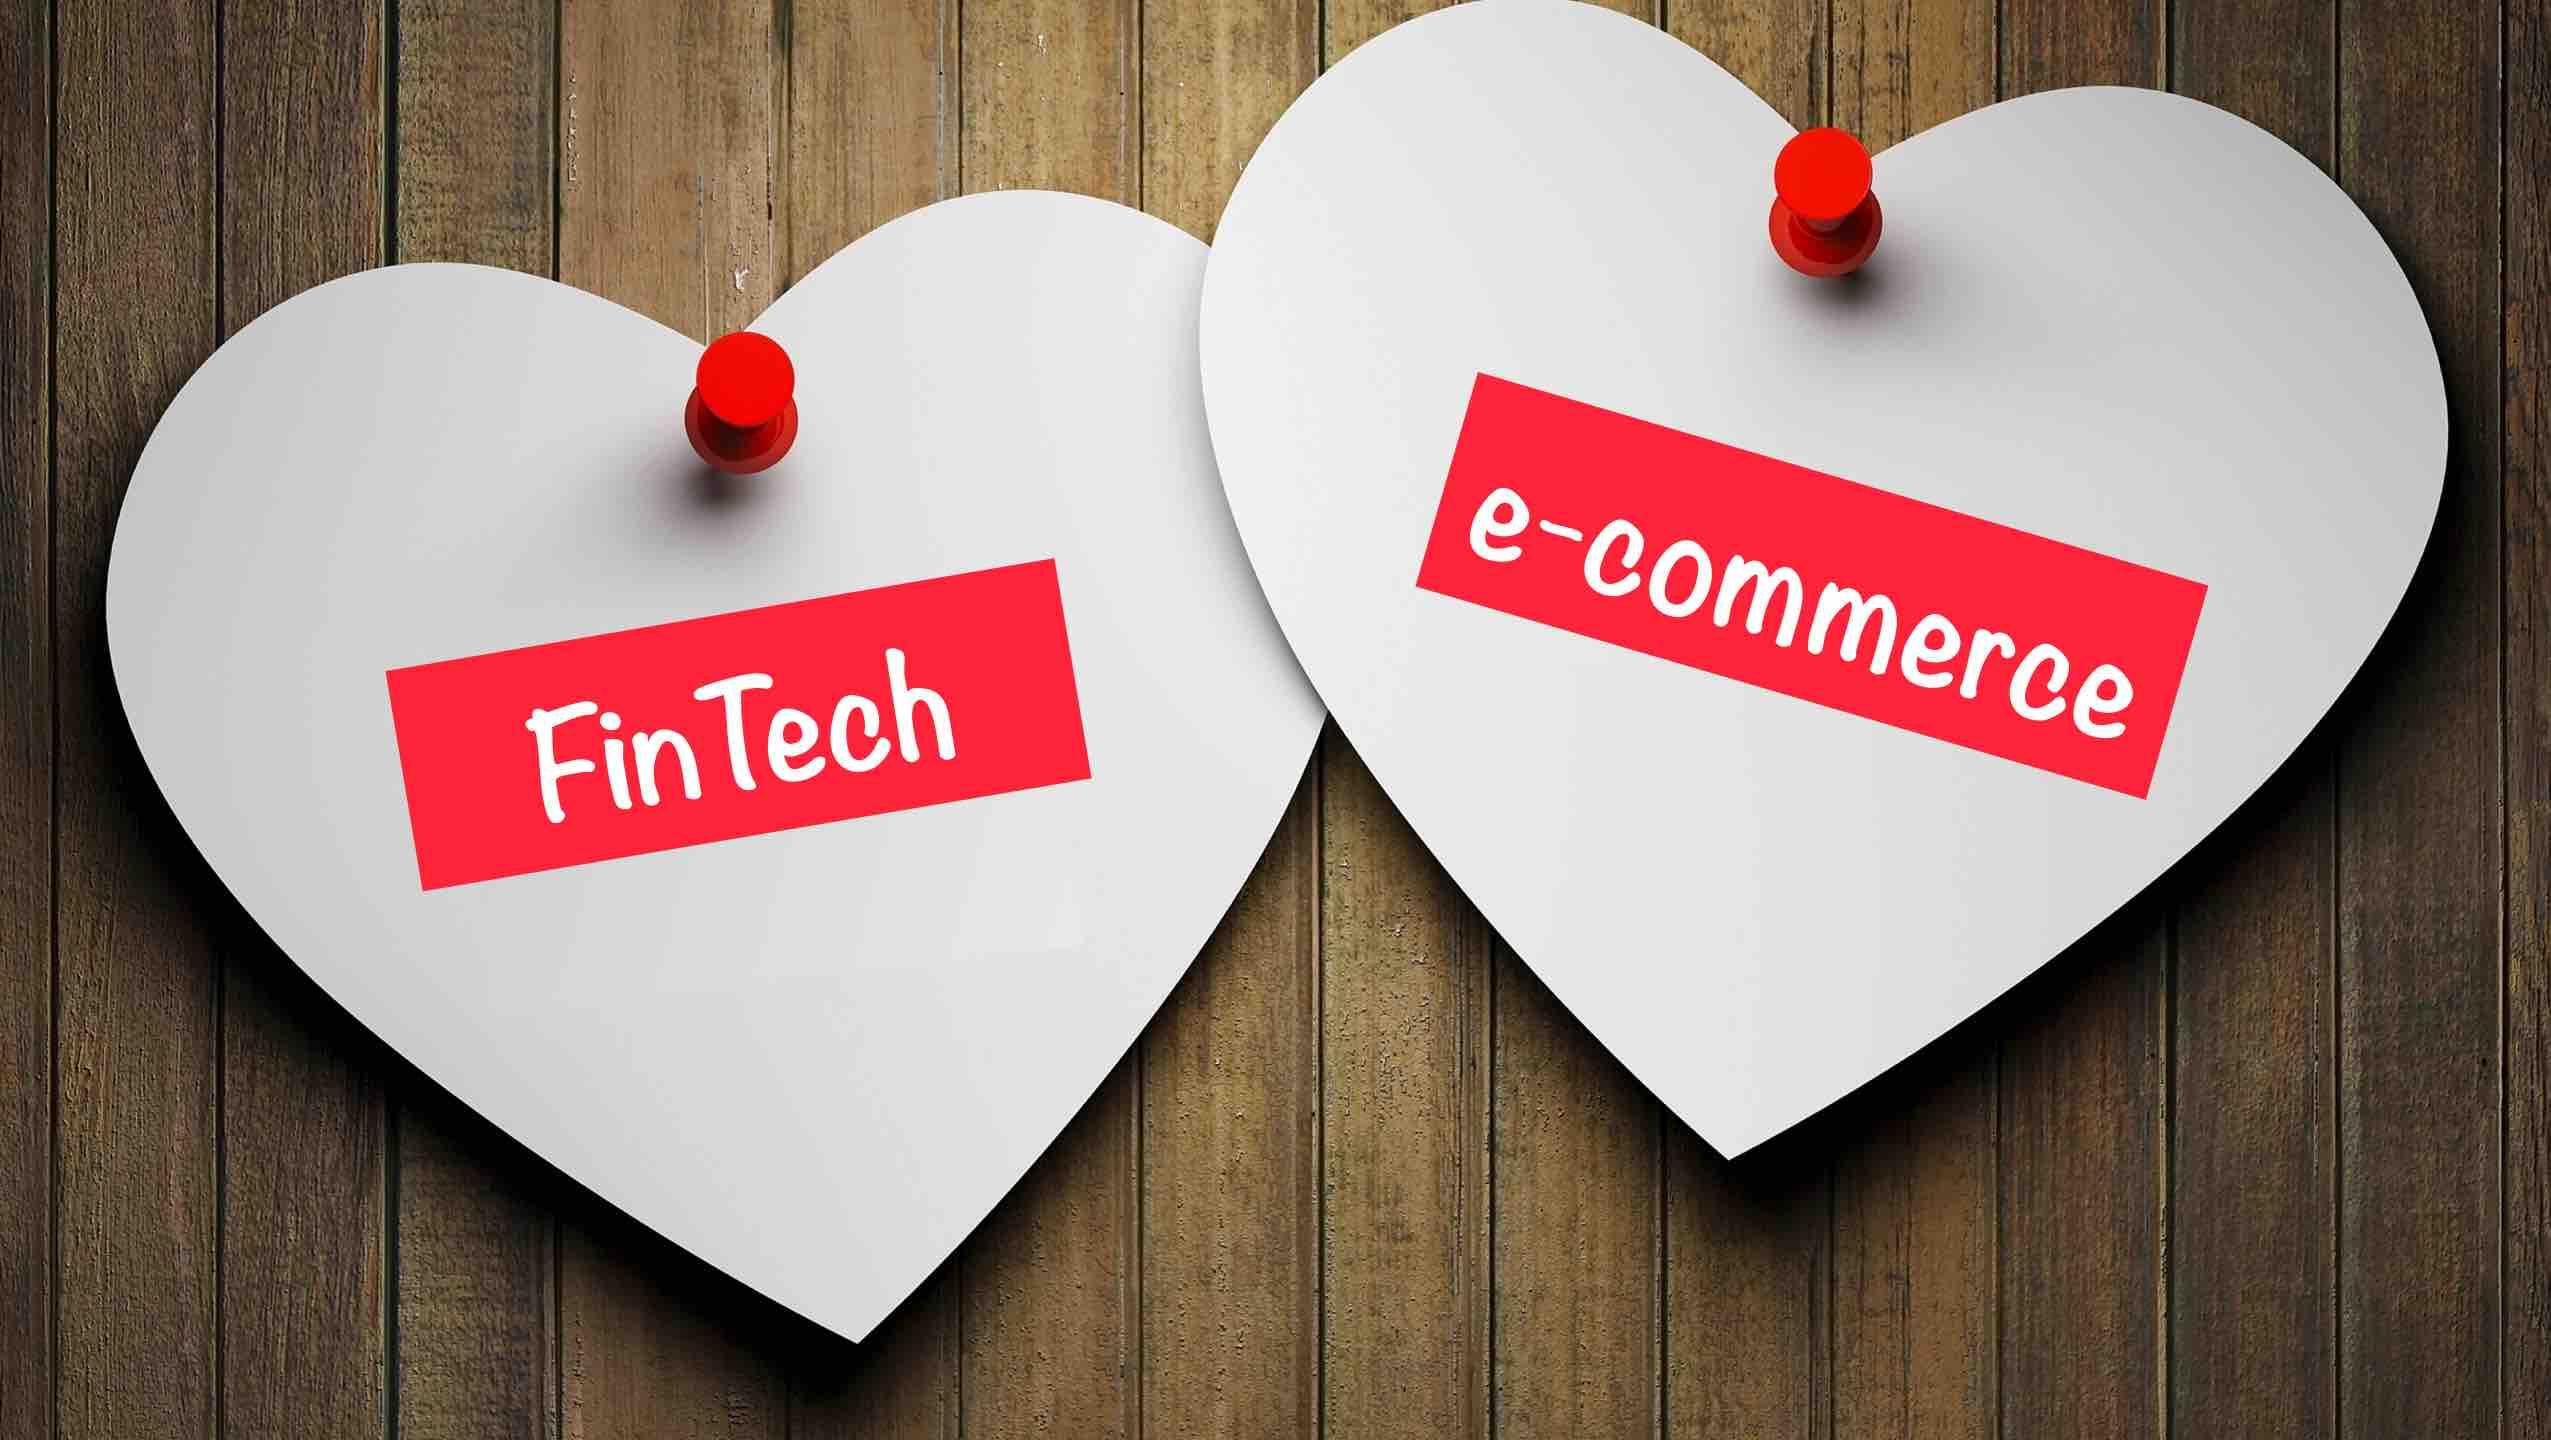 FinTech + E-commerce